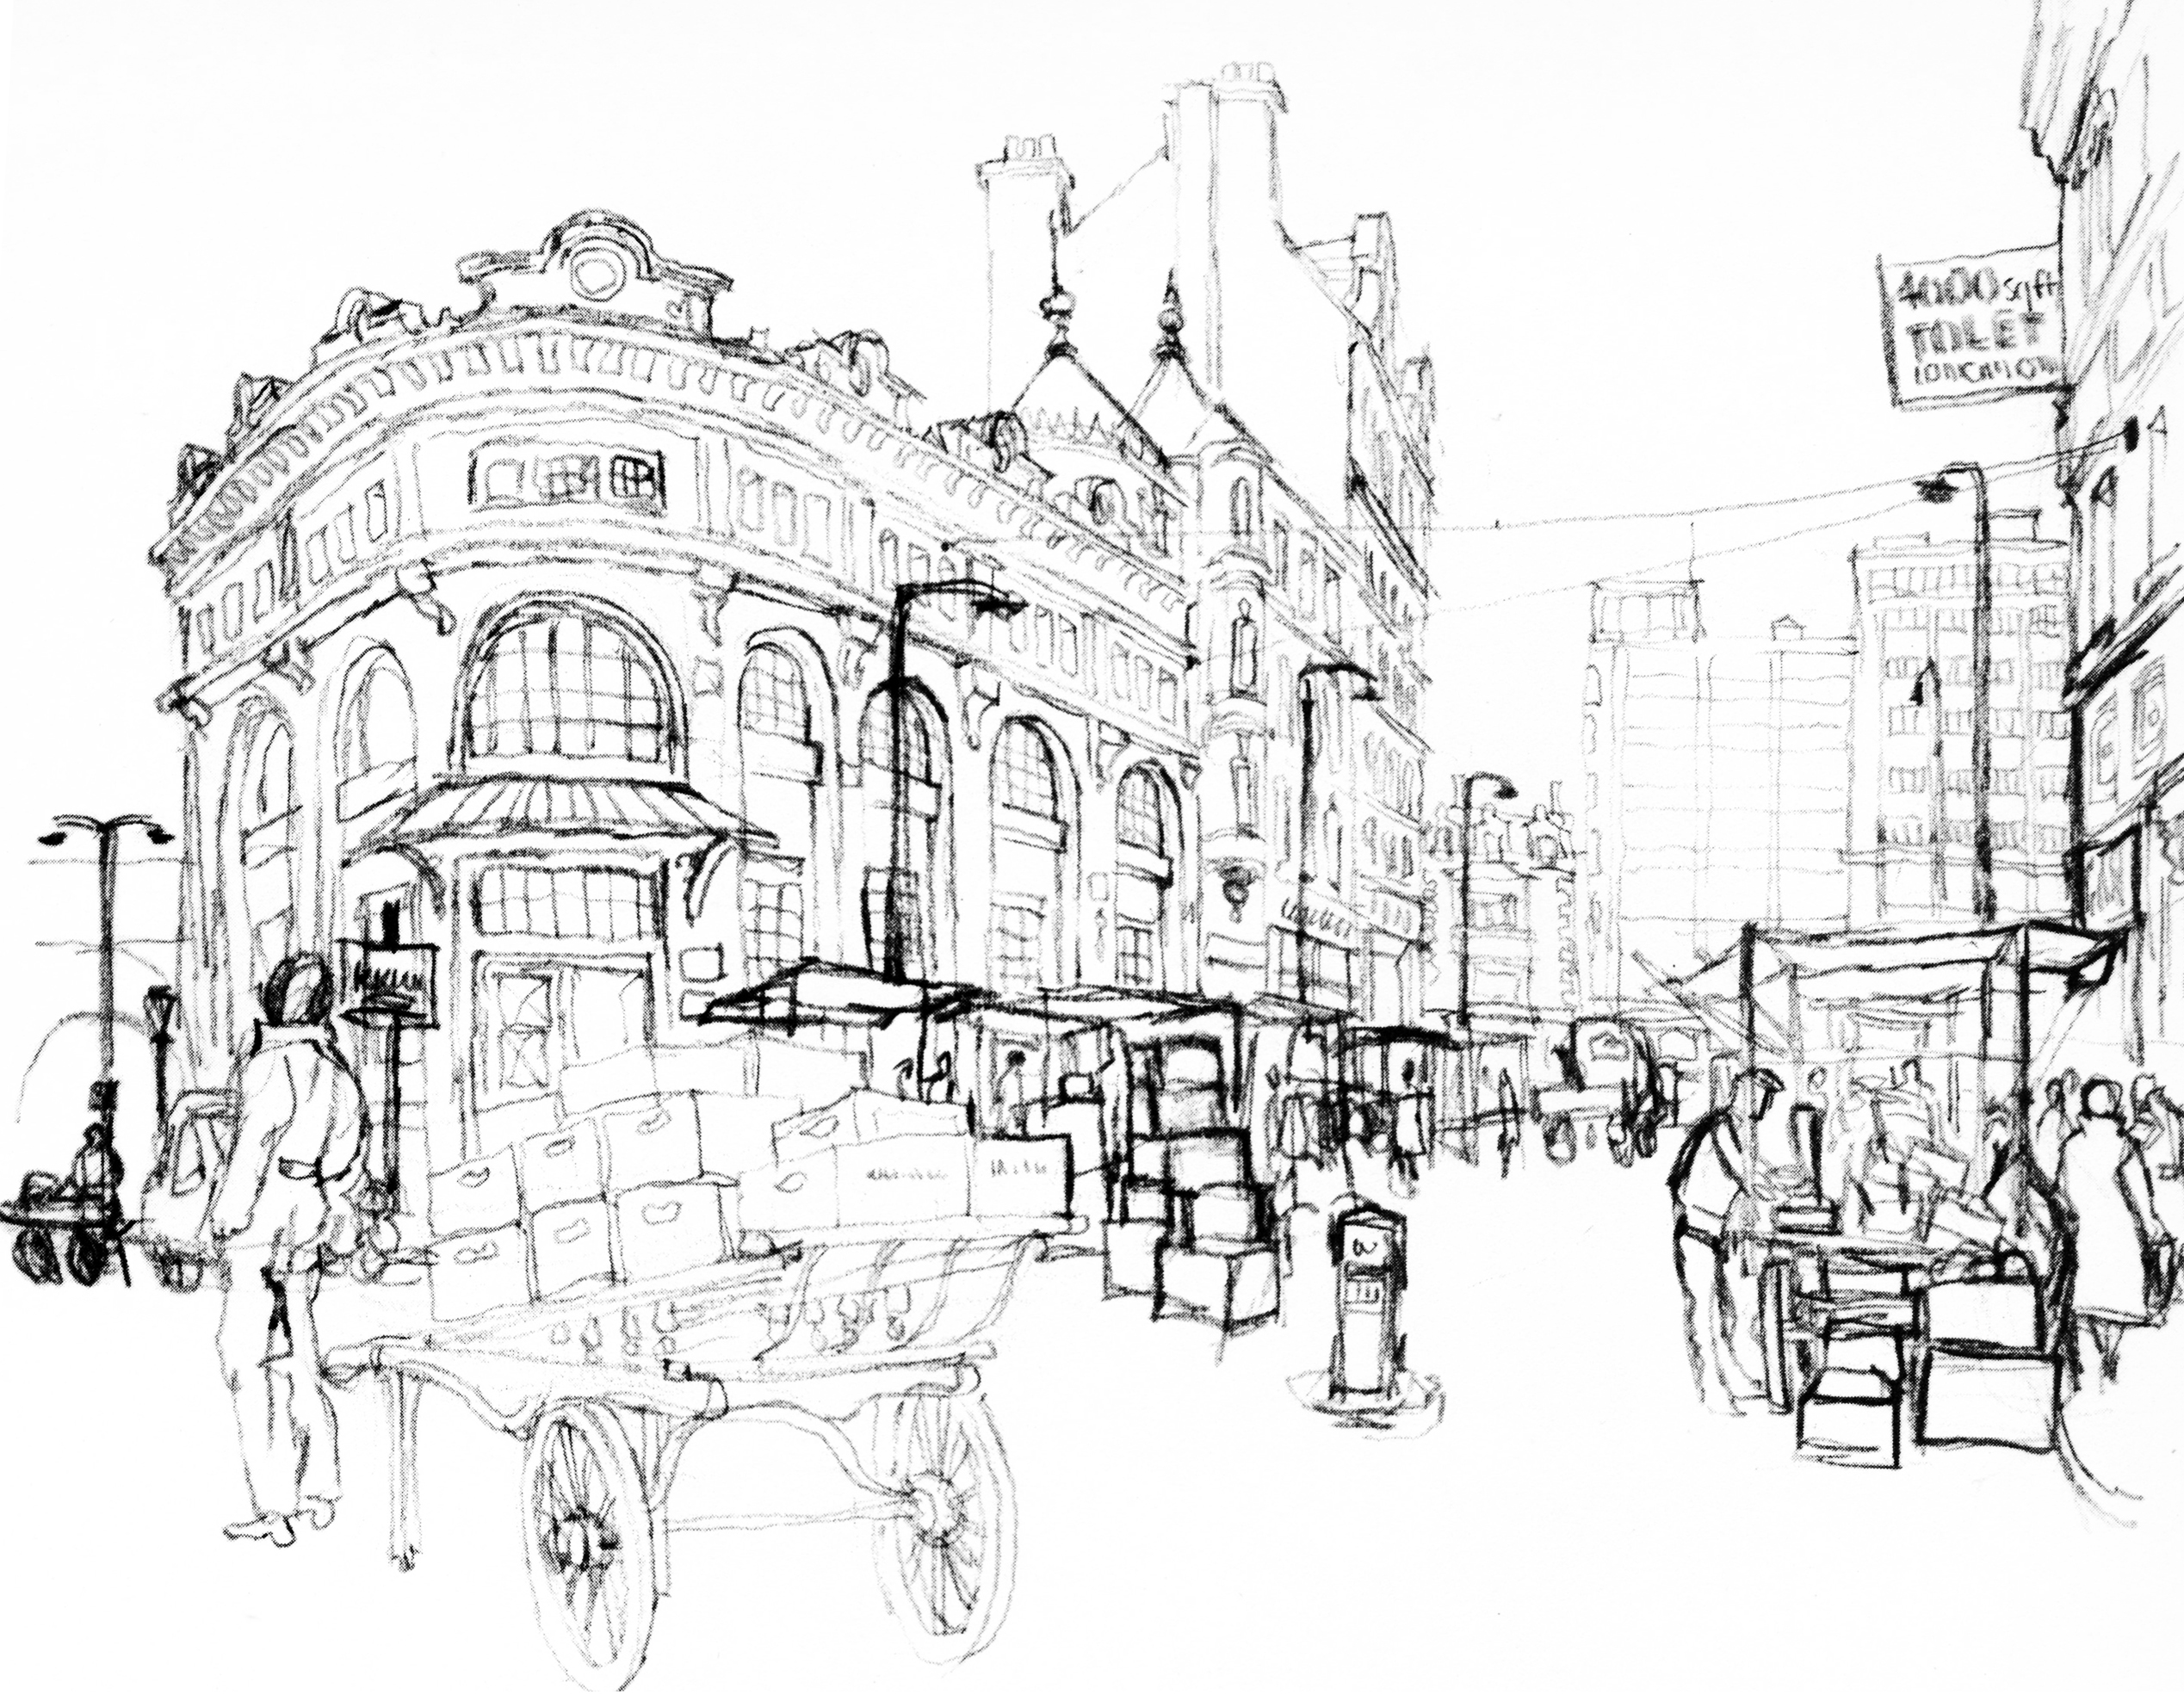 Libros para aprender a dibujar arquitectura an lisis de for Tecnicas de representacion arquitectonica pdf